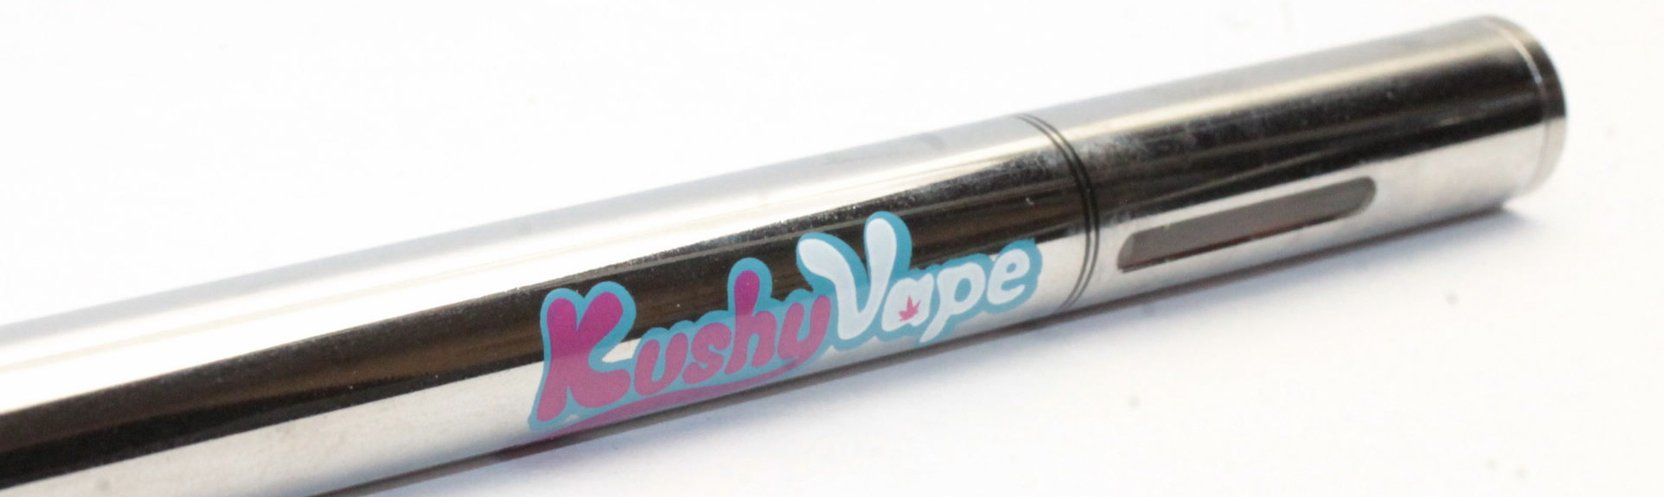 Kushy Punch Portable Disposable Vaporizer Pen